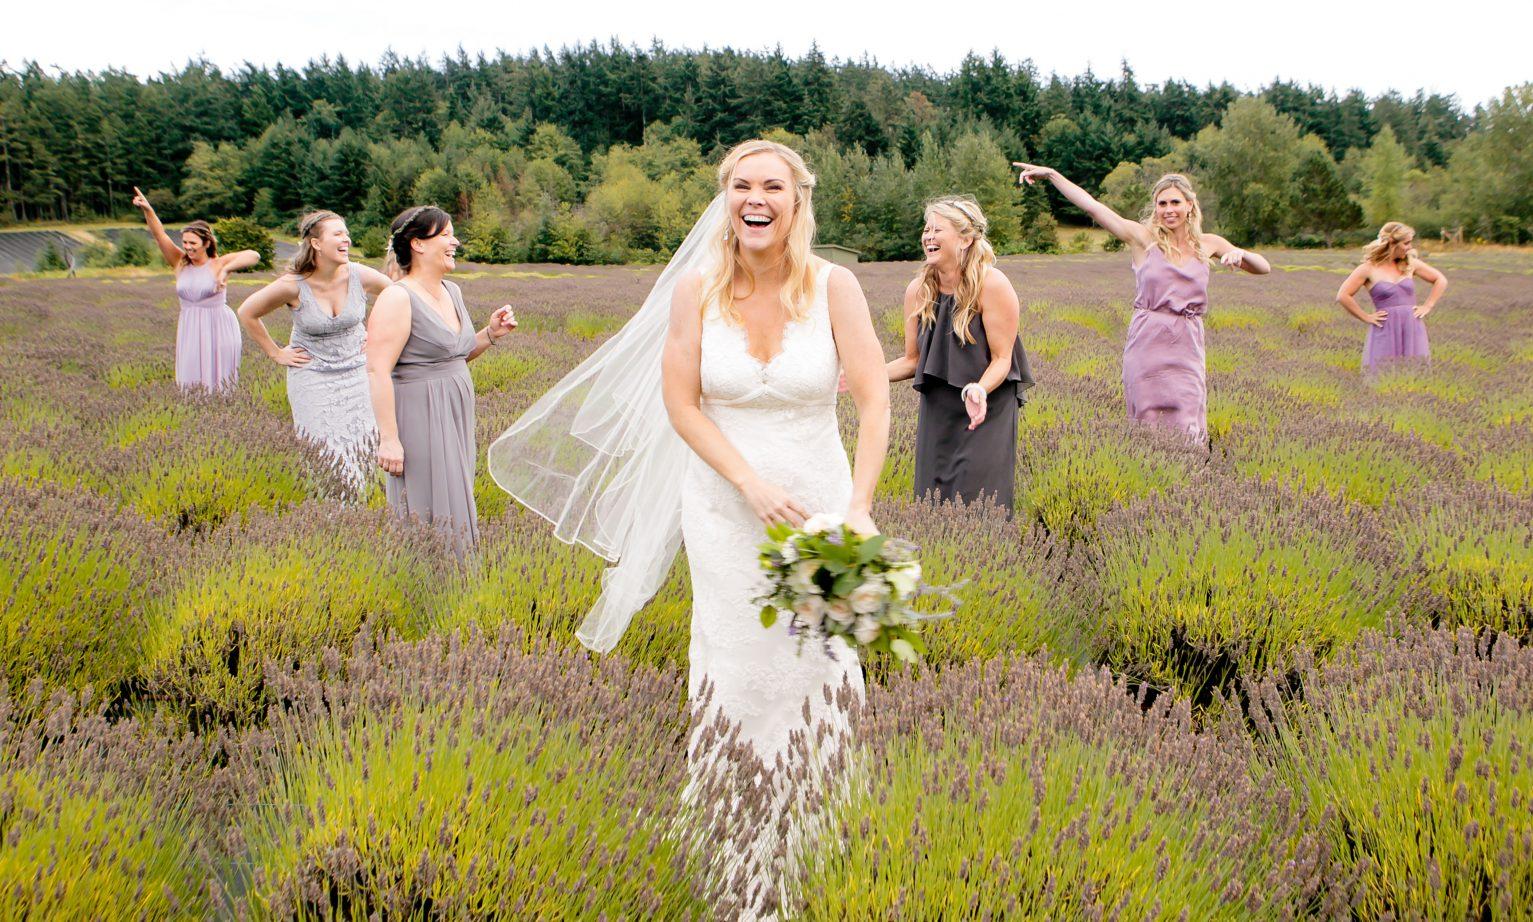 pelindaba-lavendar-farm-wedding-venue-bridesmaids-laughing-photo